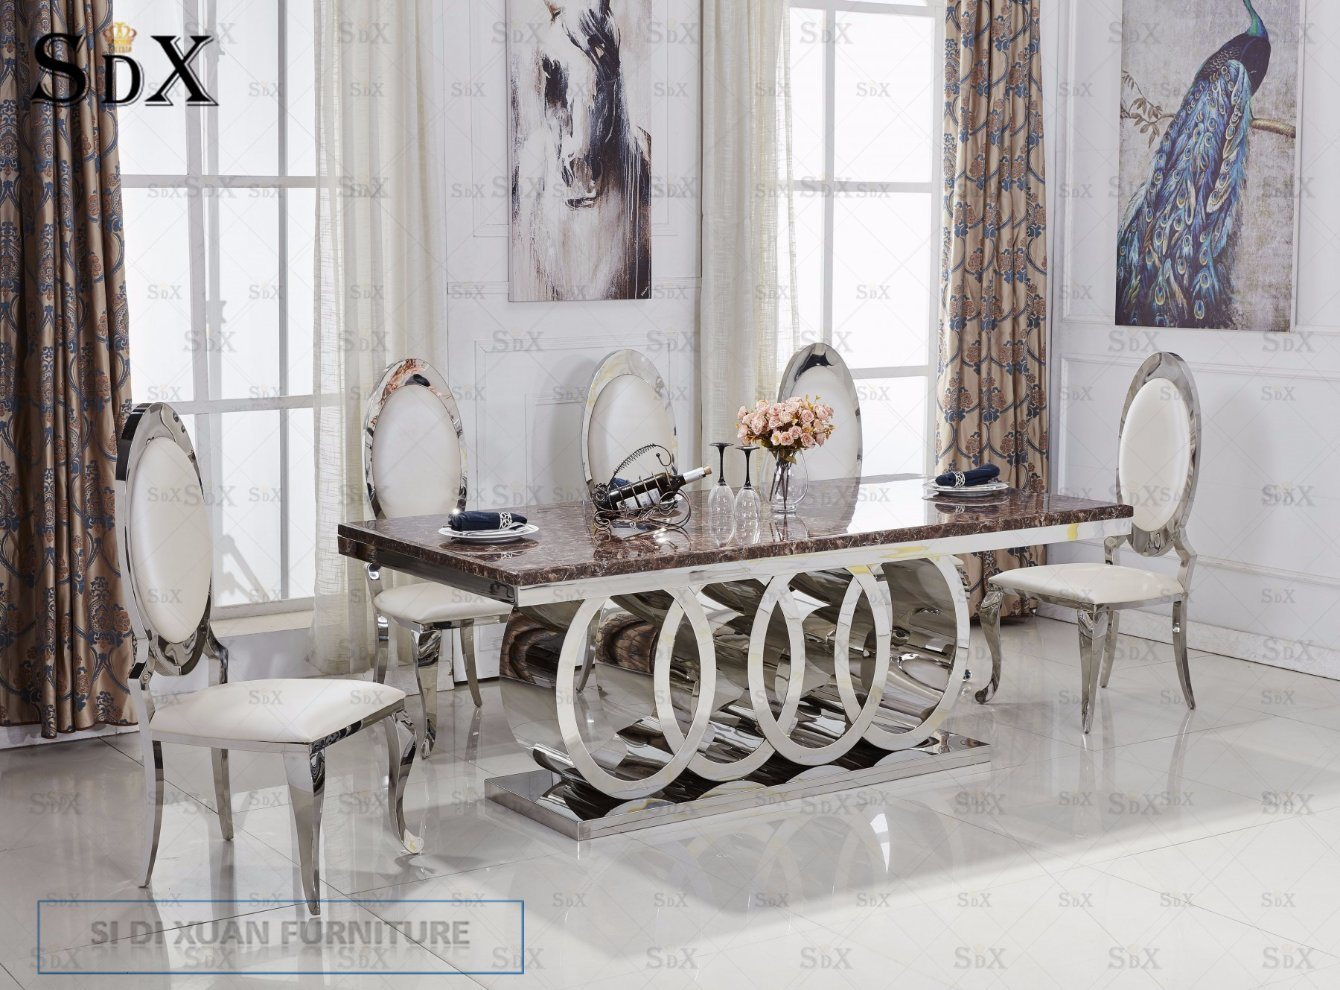 Swell Hot Item Modern Silver Stainless Steel Dining Chair Wedding Chair Machost Co Dining Chair Design Ideas Machostcouk